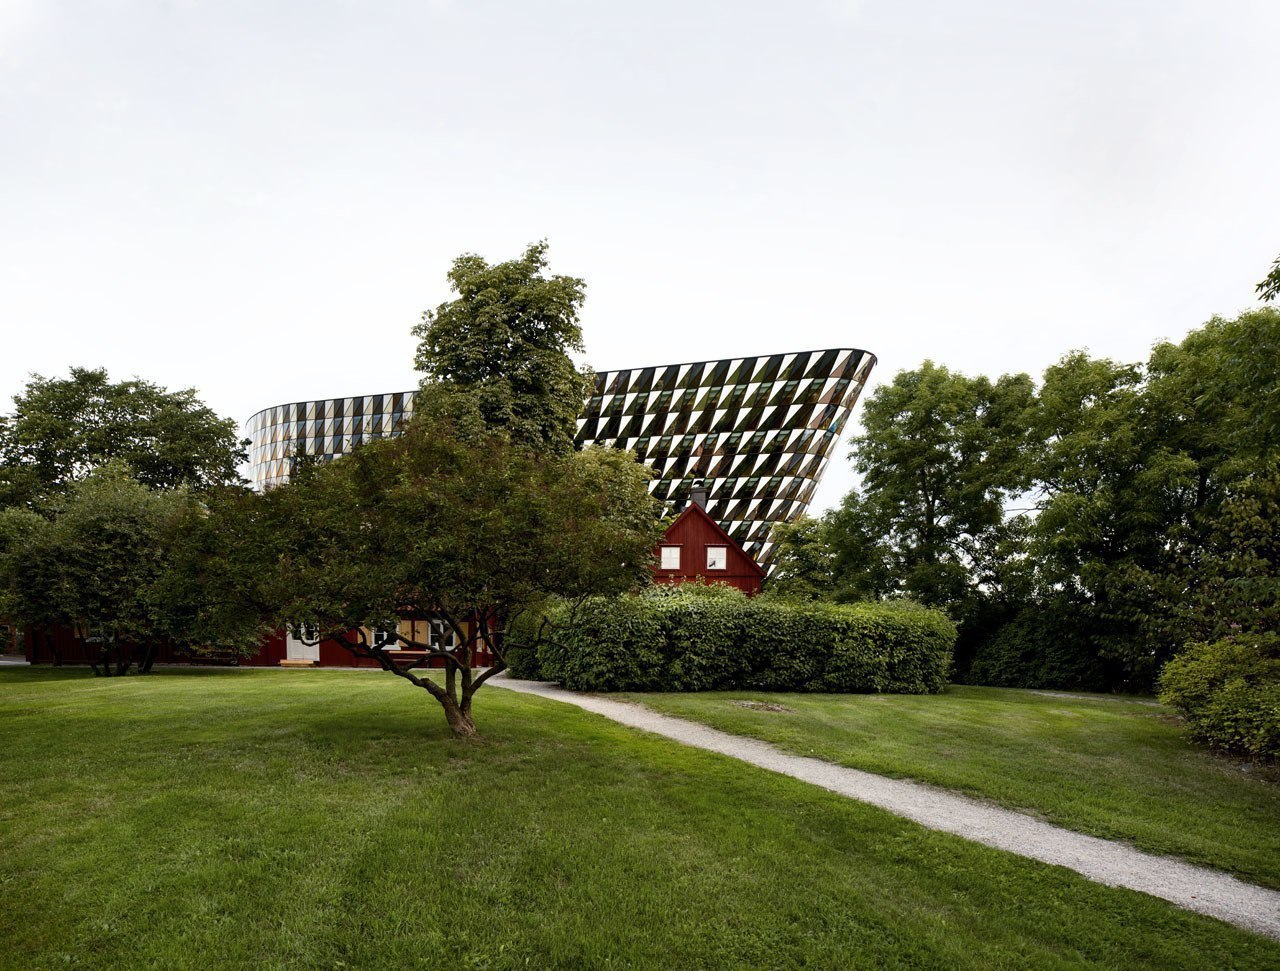 Aula Medica / Wingårdhs / Solna, Sweden